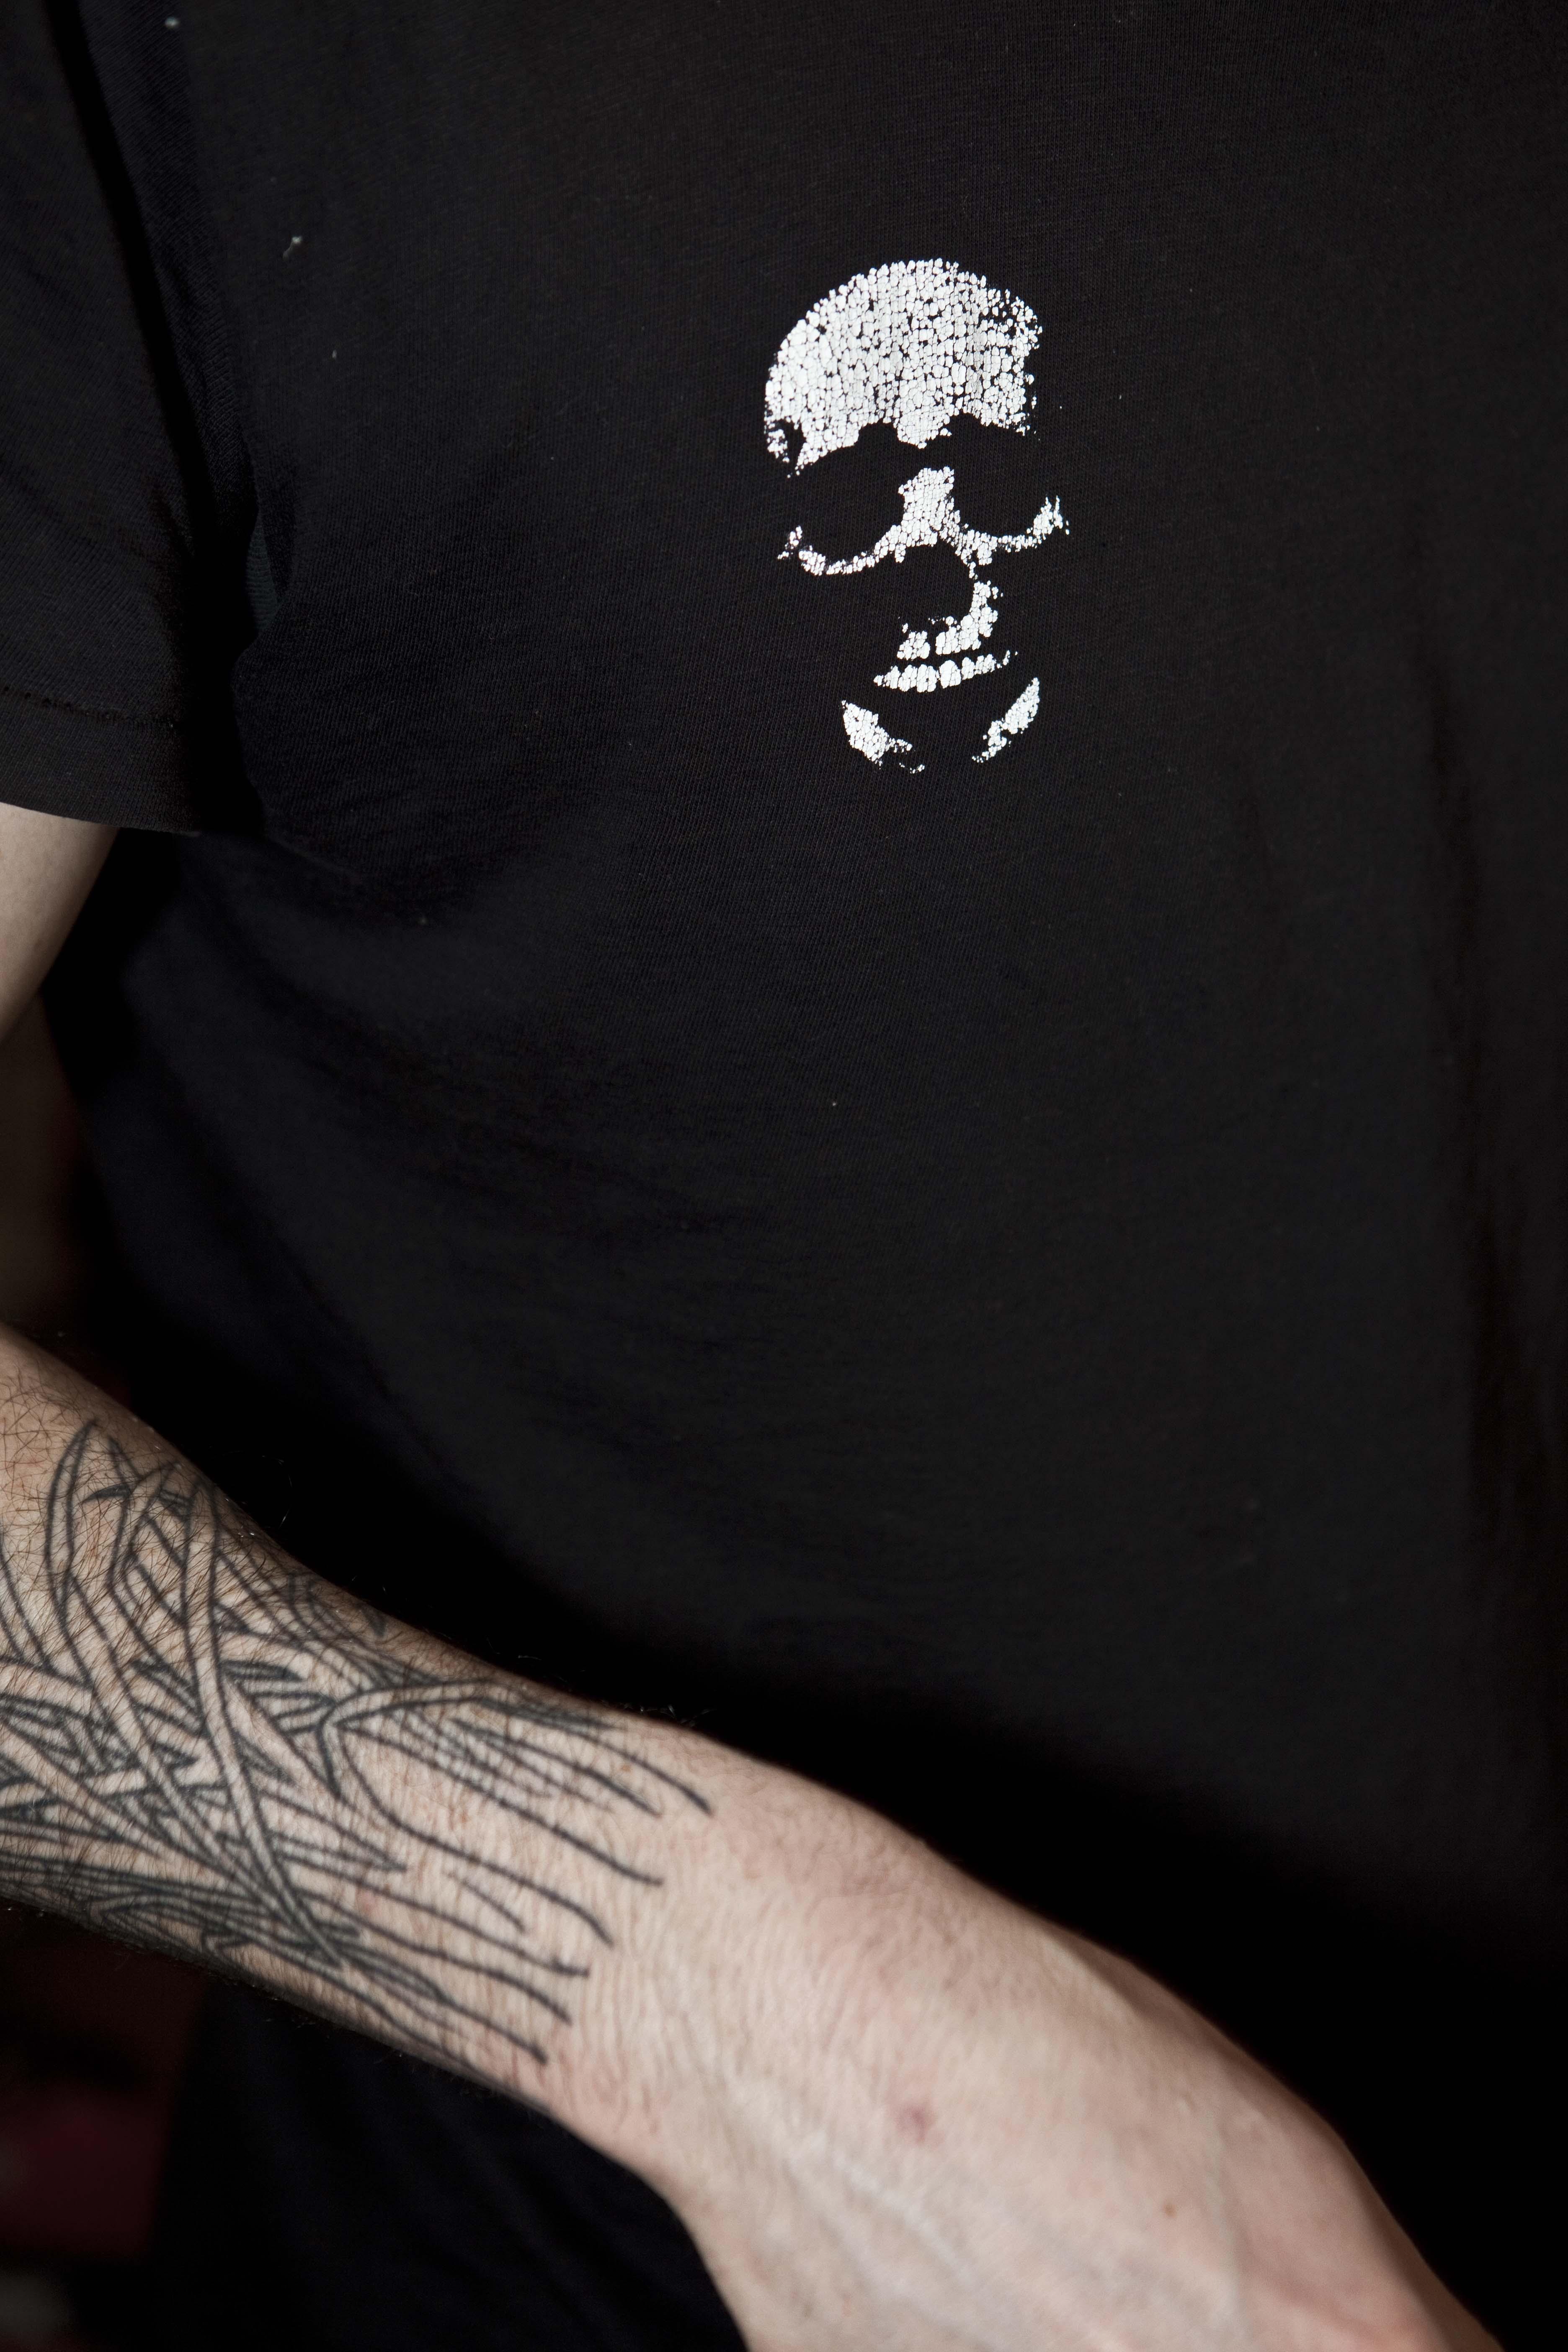 Christian_Vagt_Punk_Skin-13_Tyler_Montreal_2010